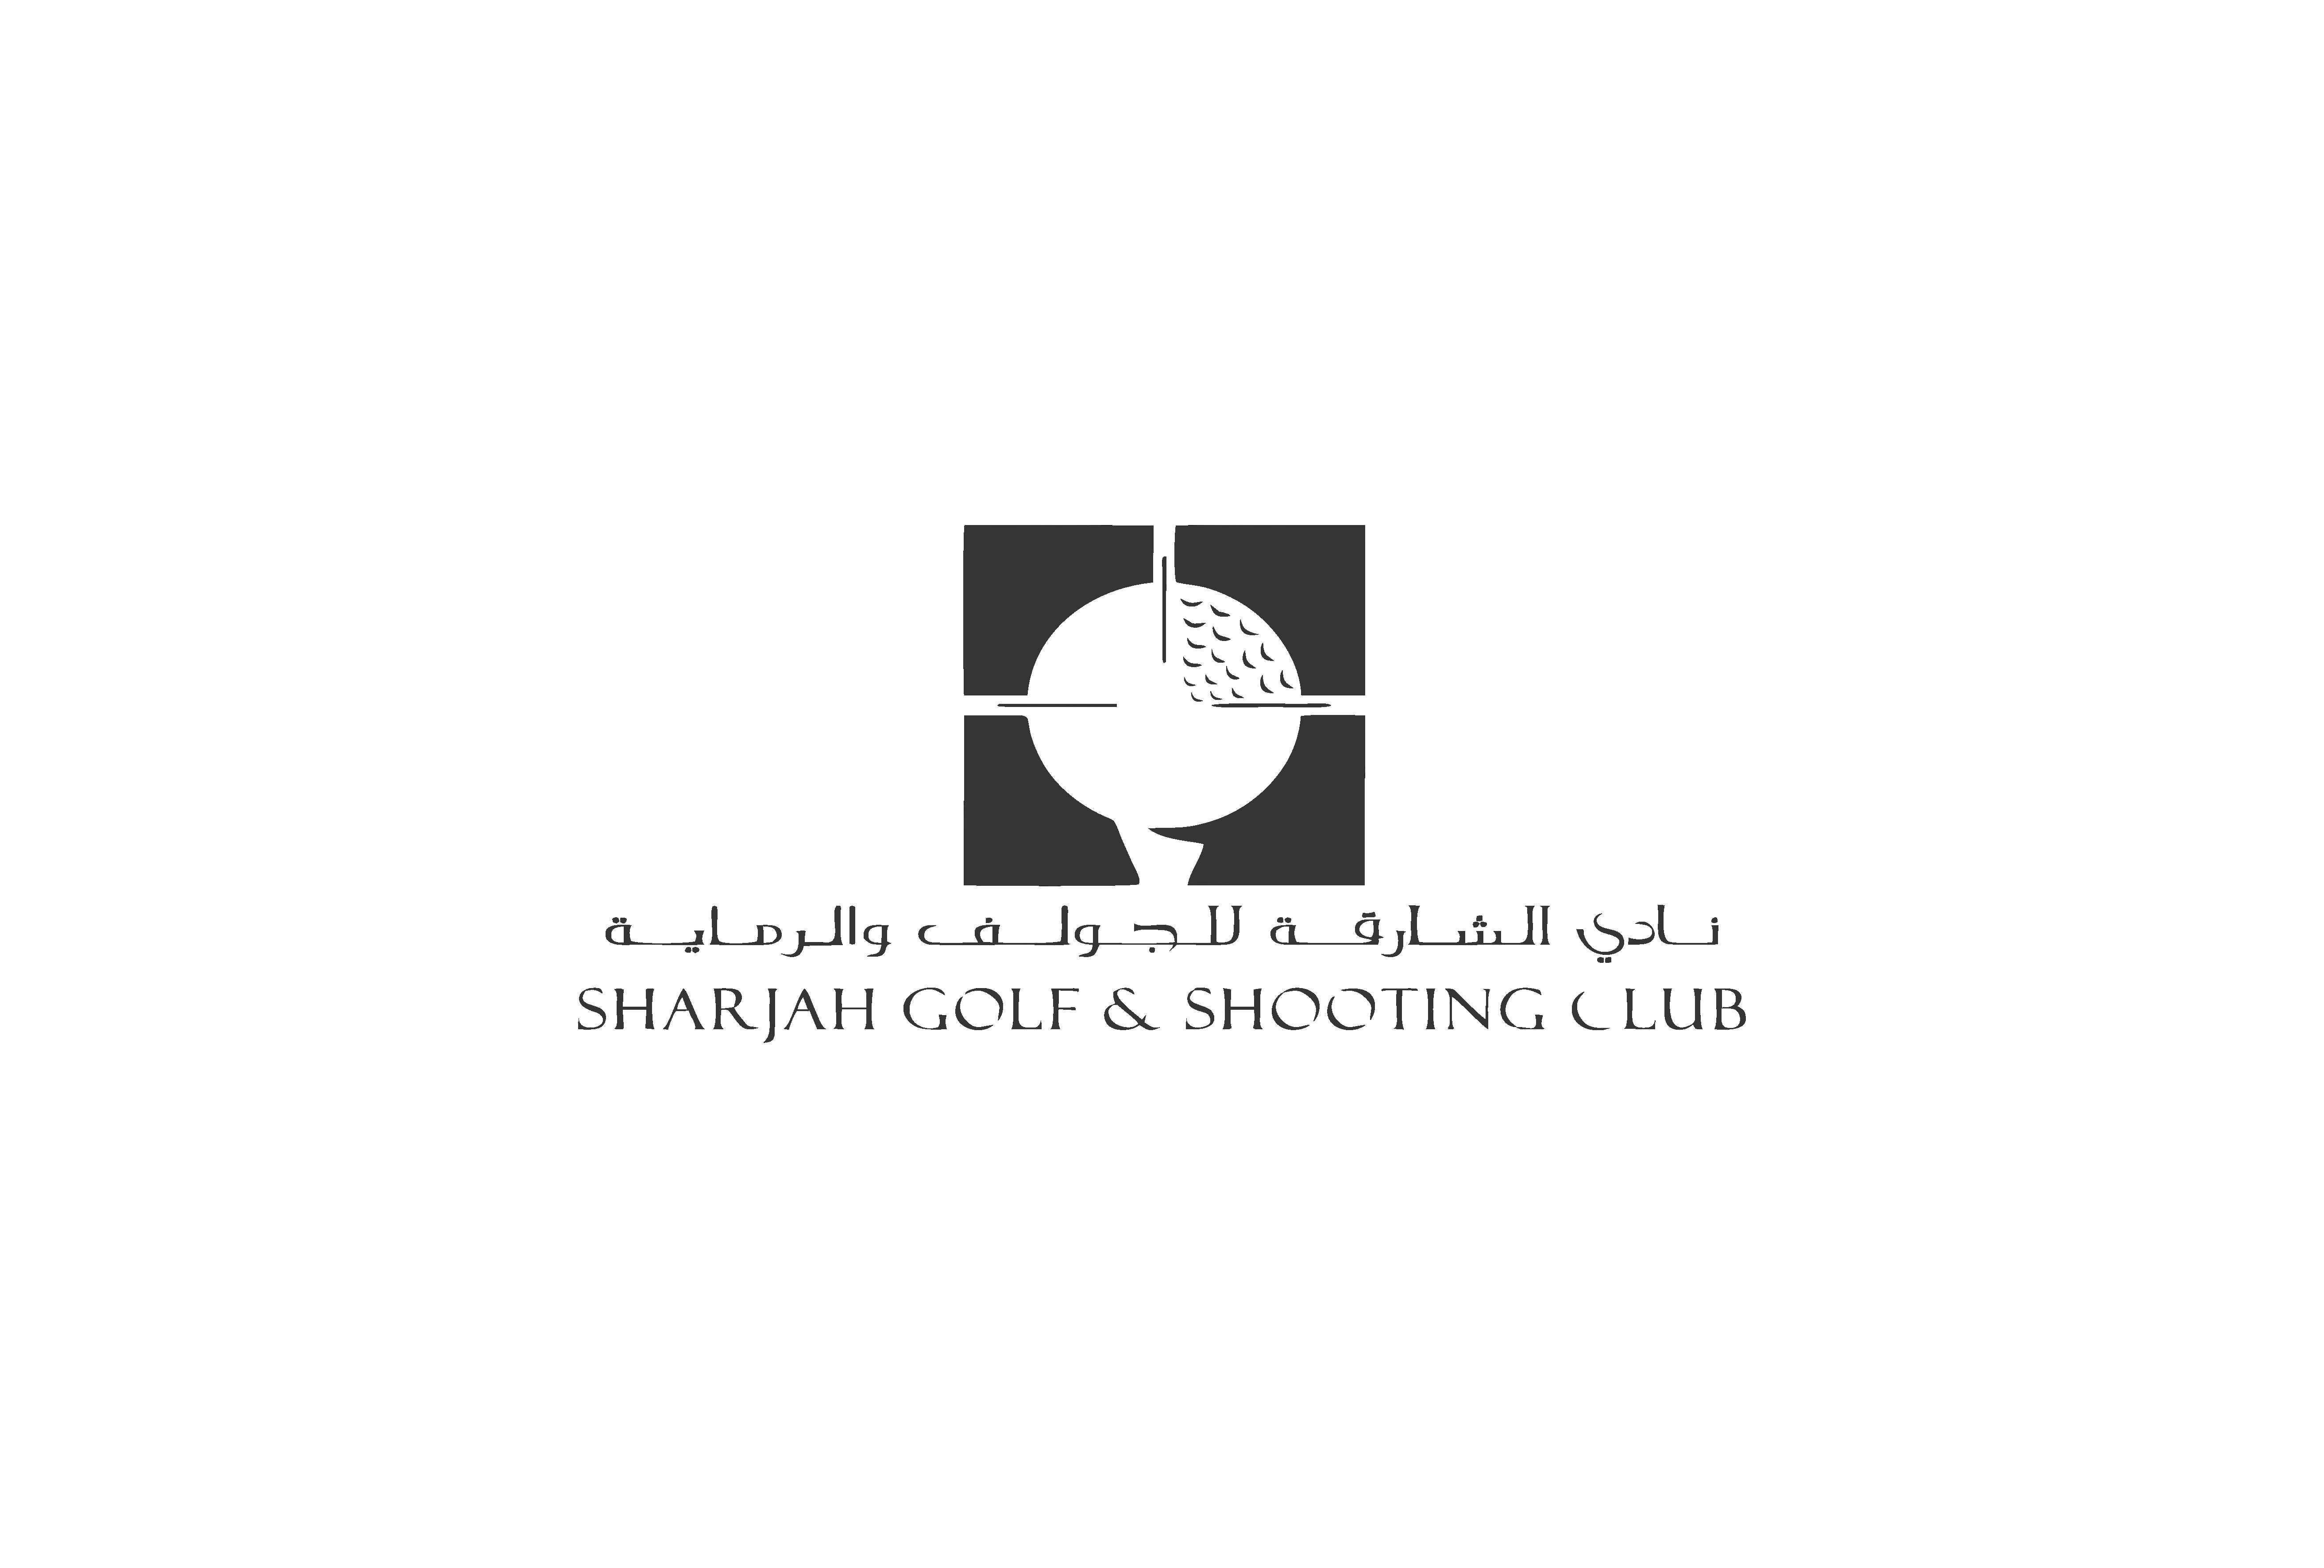 sharjah golf shooting club Final